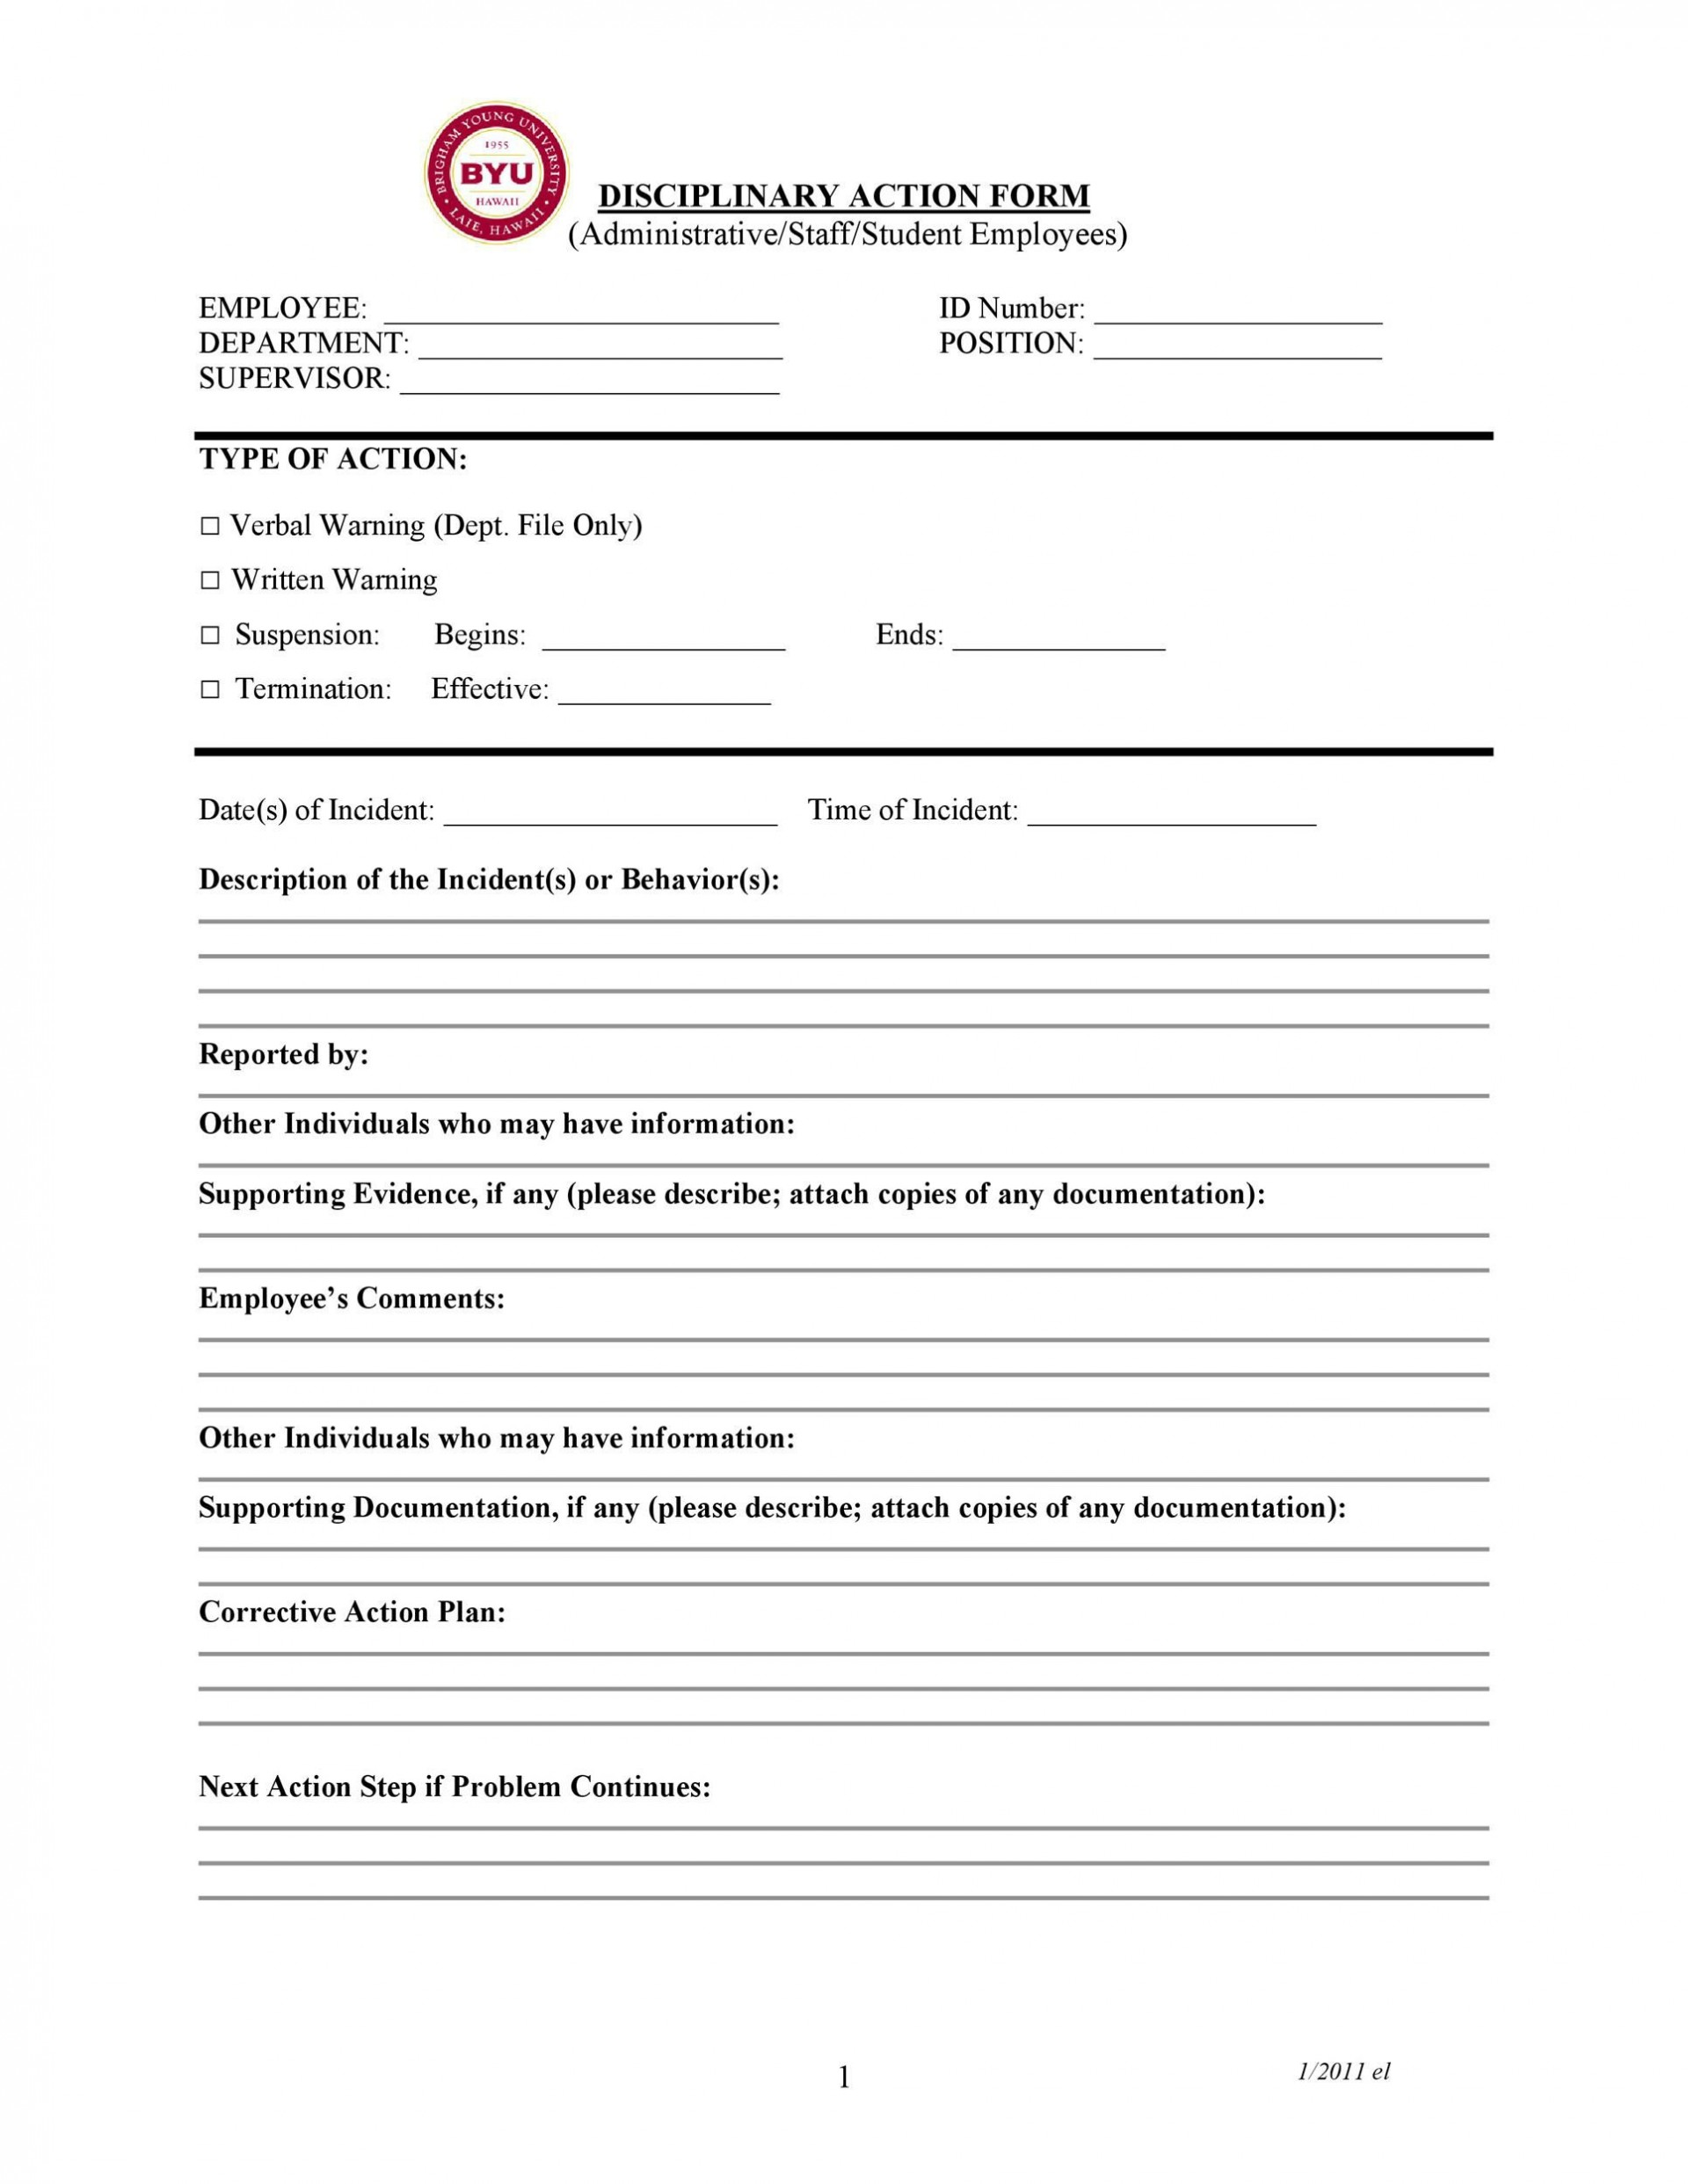 001 Astounding Employee Discipline Form Template Idea  Free Disciplinary Letter Action1920